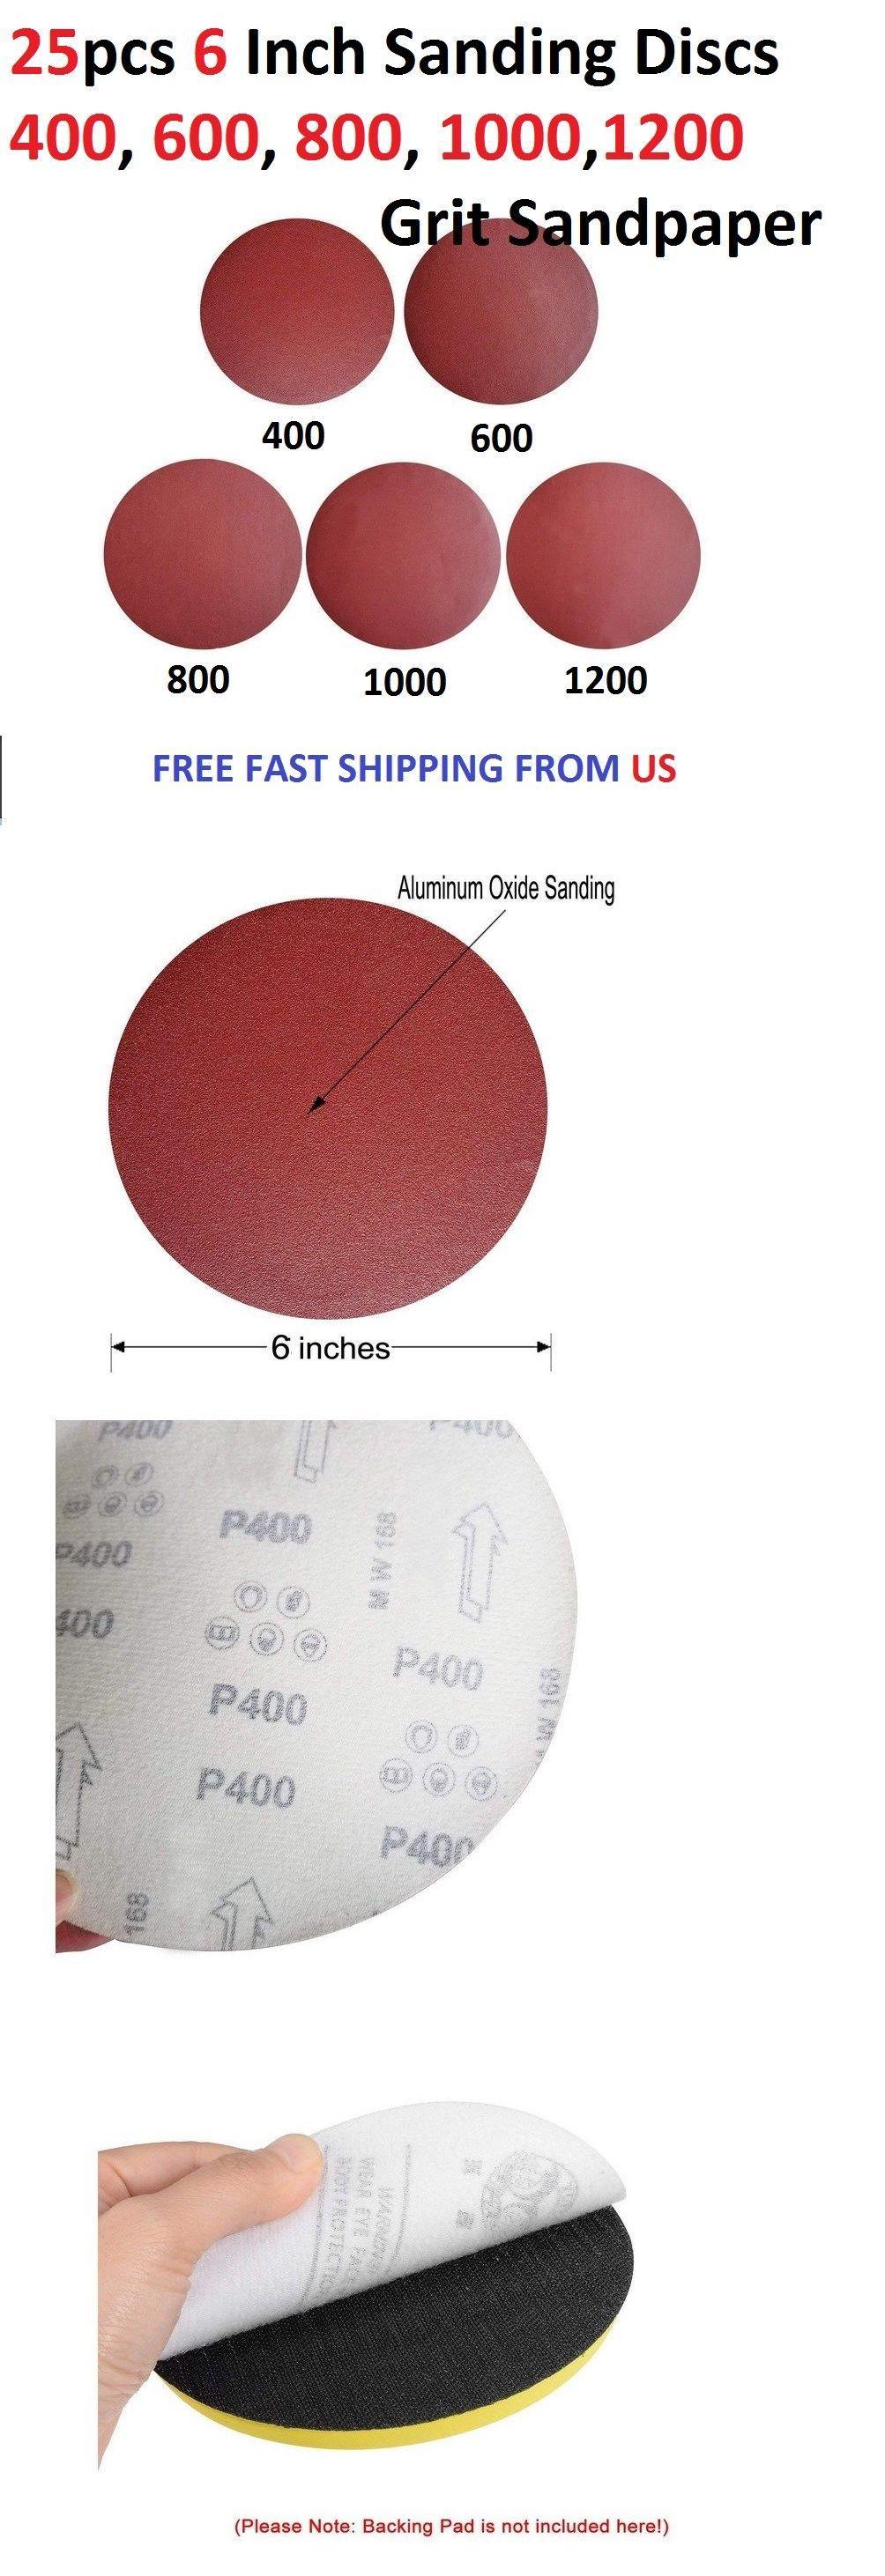 Sander Parts And Accessories 20796 25pcs 6 Inch Sanding Discs 400 600 800 1000 1200 Grit Sandpaper Buy It Now On Sanding Sandpaper Parts And Accessories